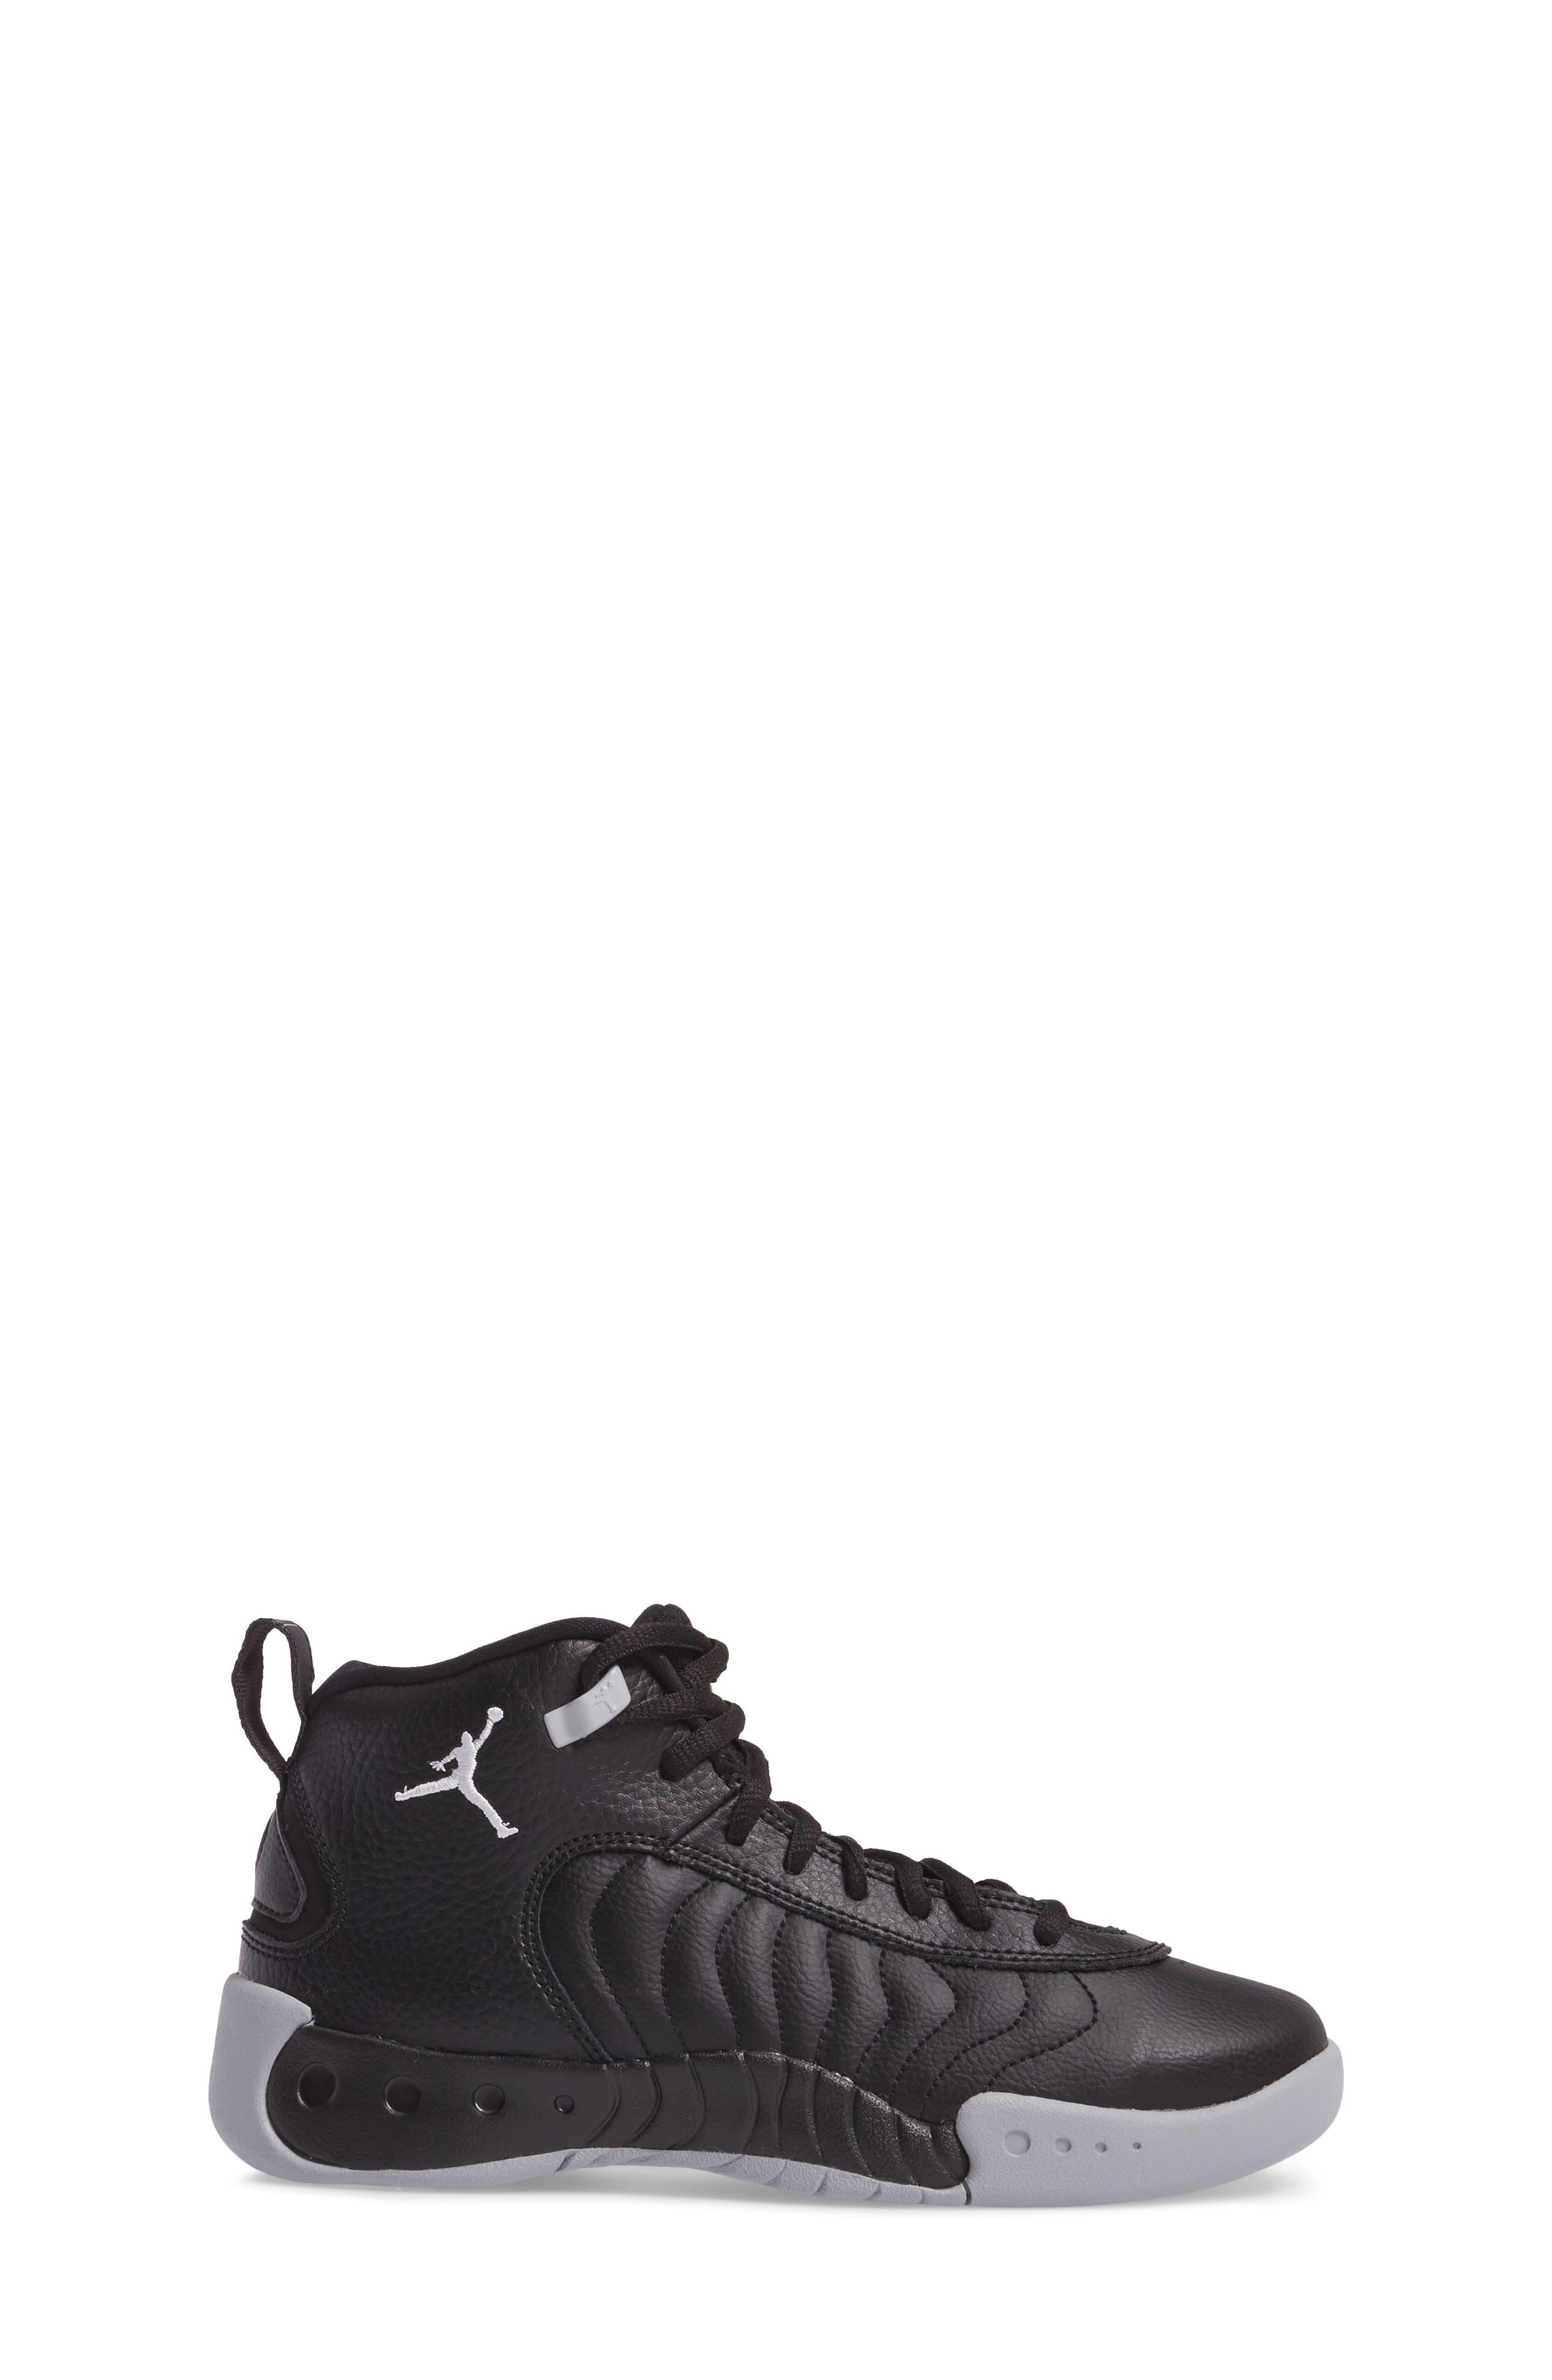 Jumpman Pro BG Mid Top Sneaker,                             Alternate thumbnail 3, color,                             012